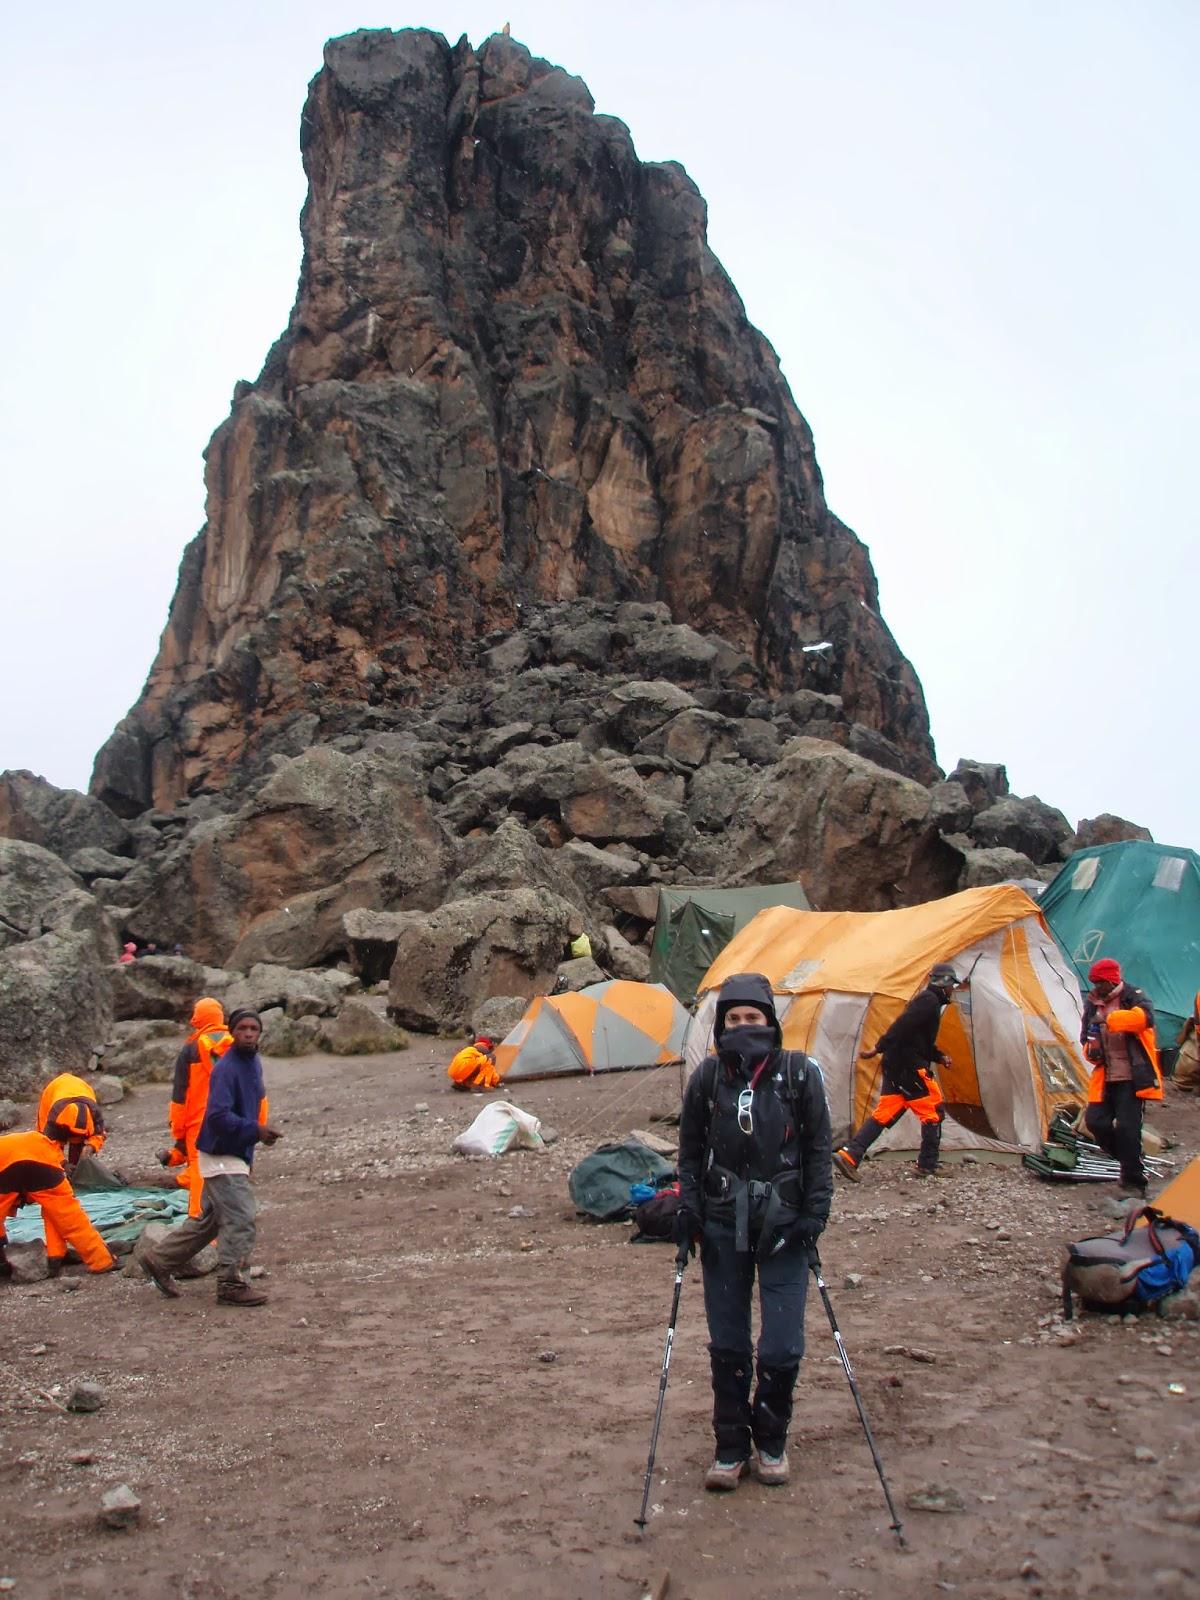 ENLACIMA-Inma-delante-de-Lava-Tower-Kilimanjaro-Ruta-Machame